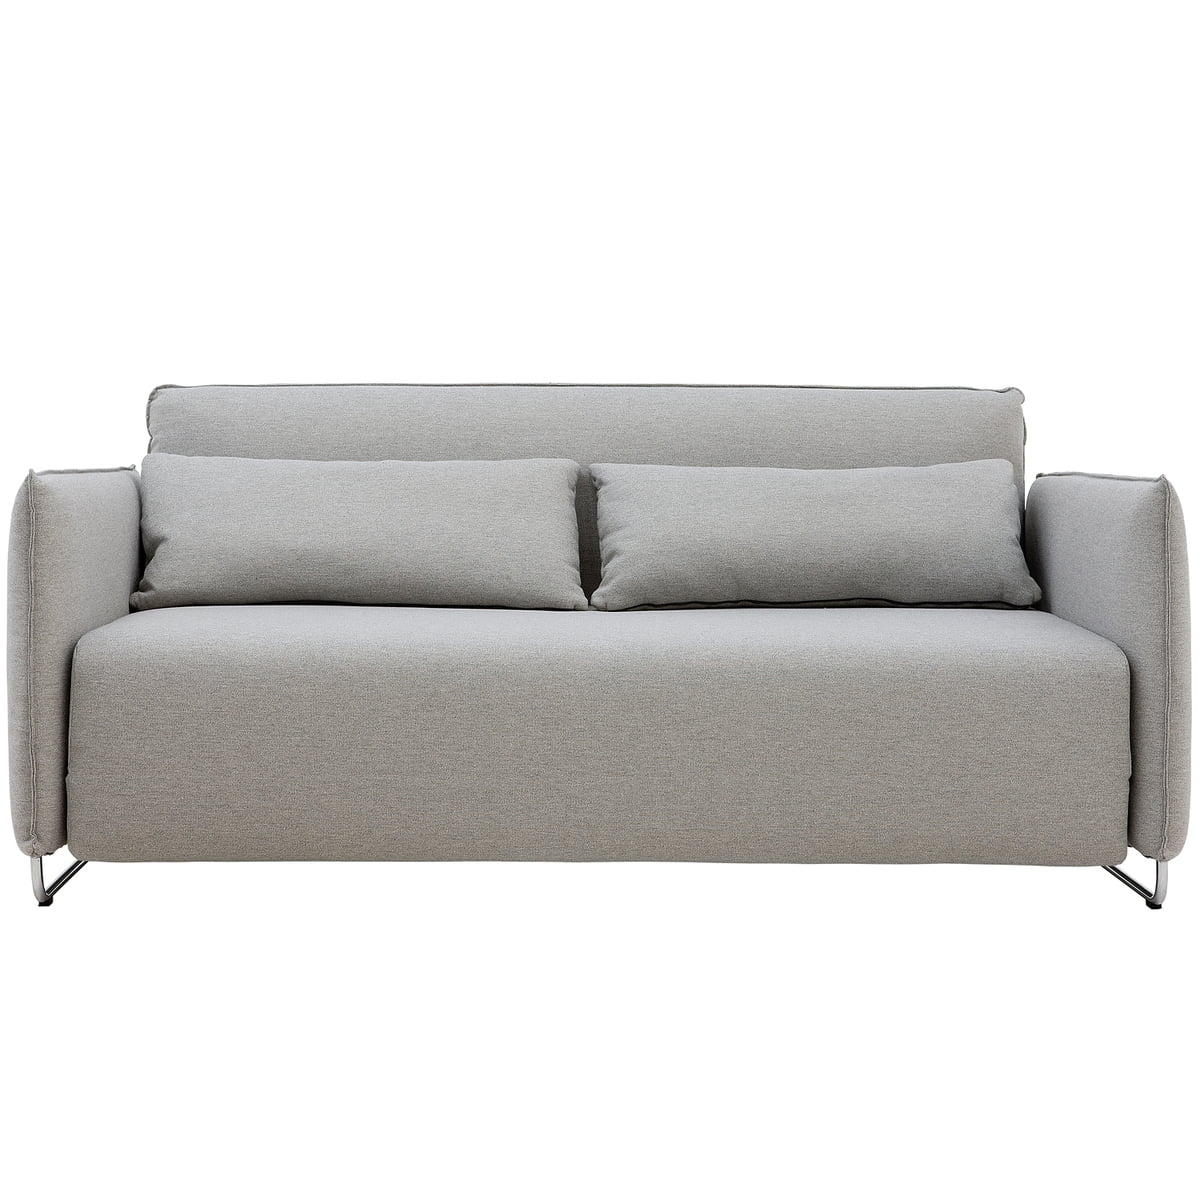 Cord Sofa Bed | Softline | Shop